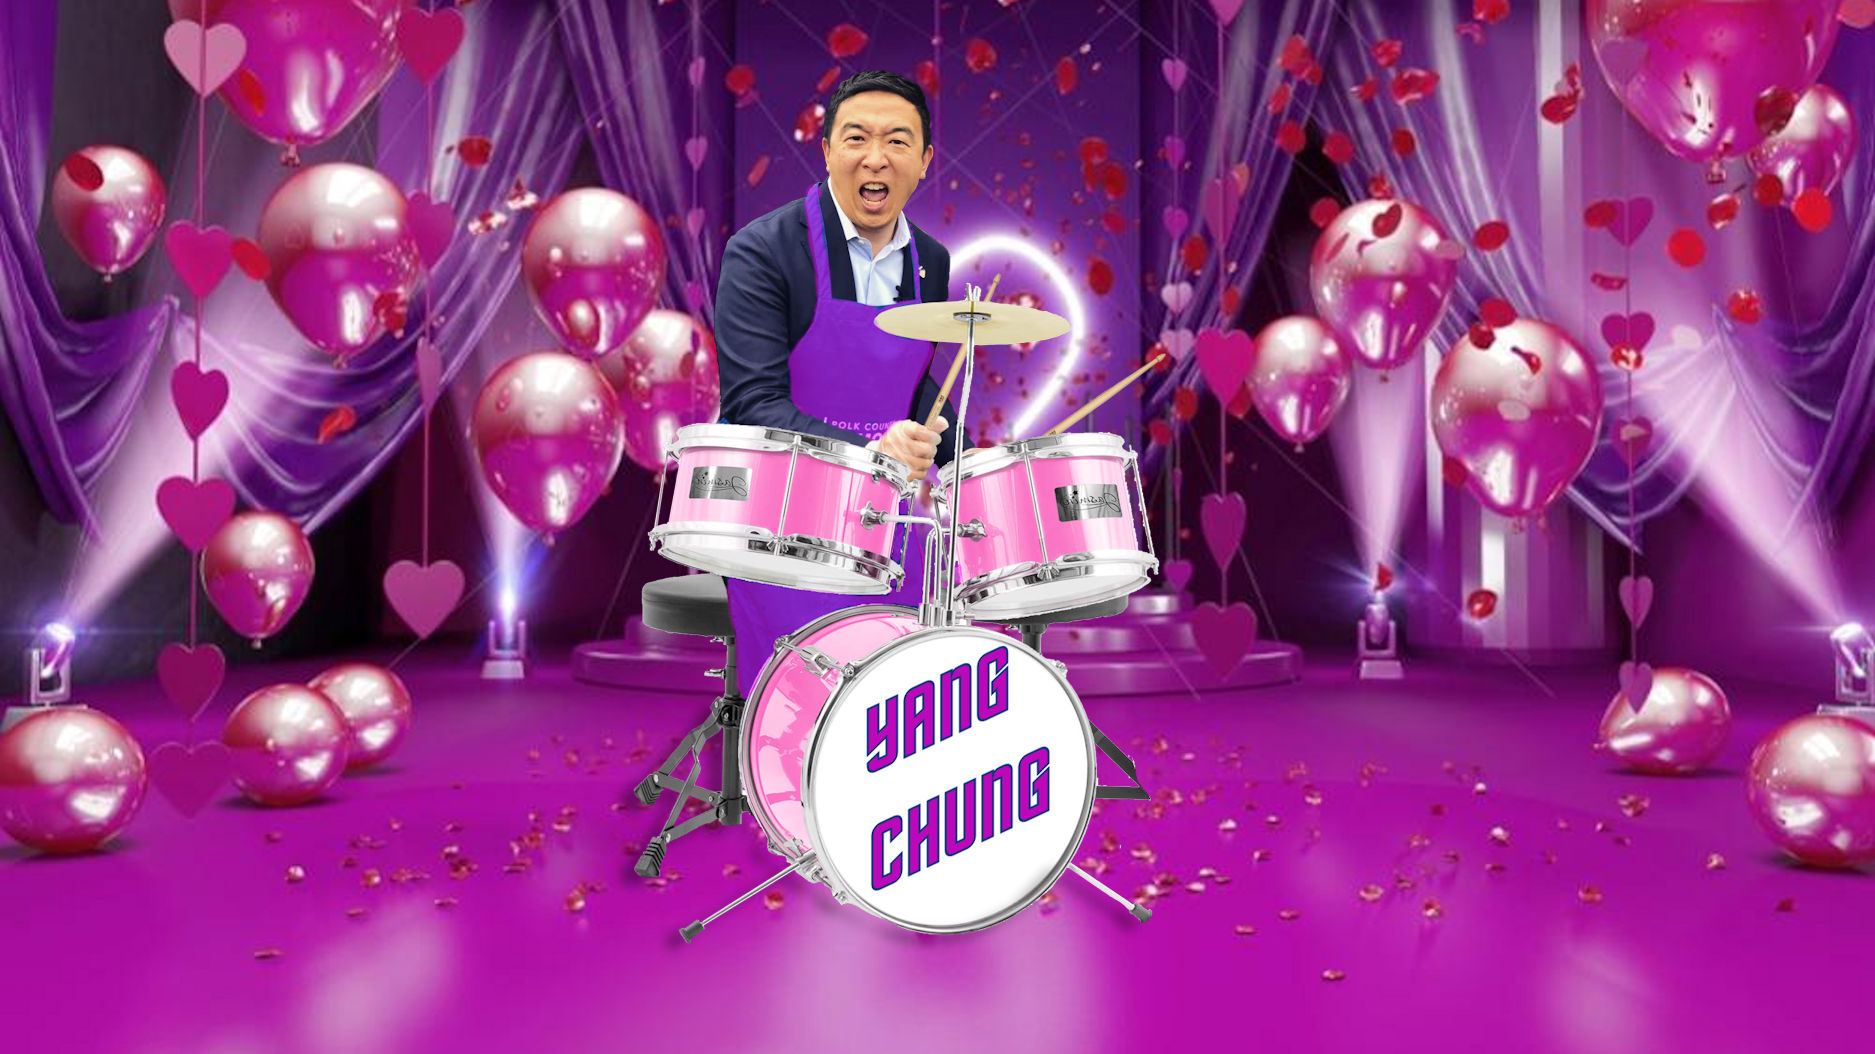 ...everybody Yang Chung